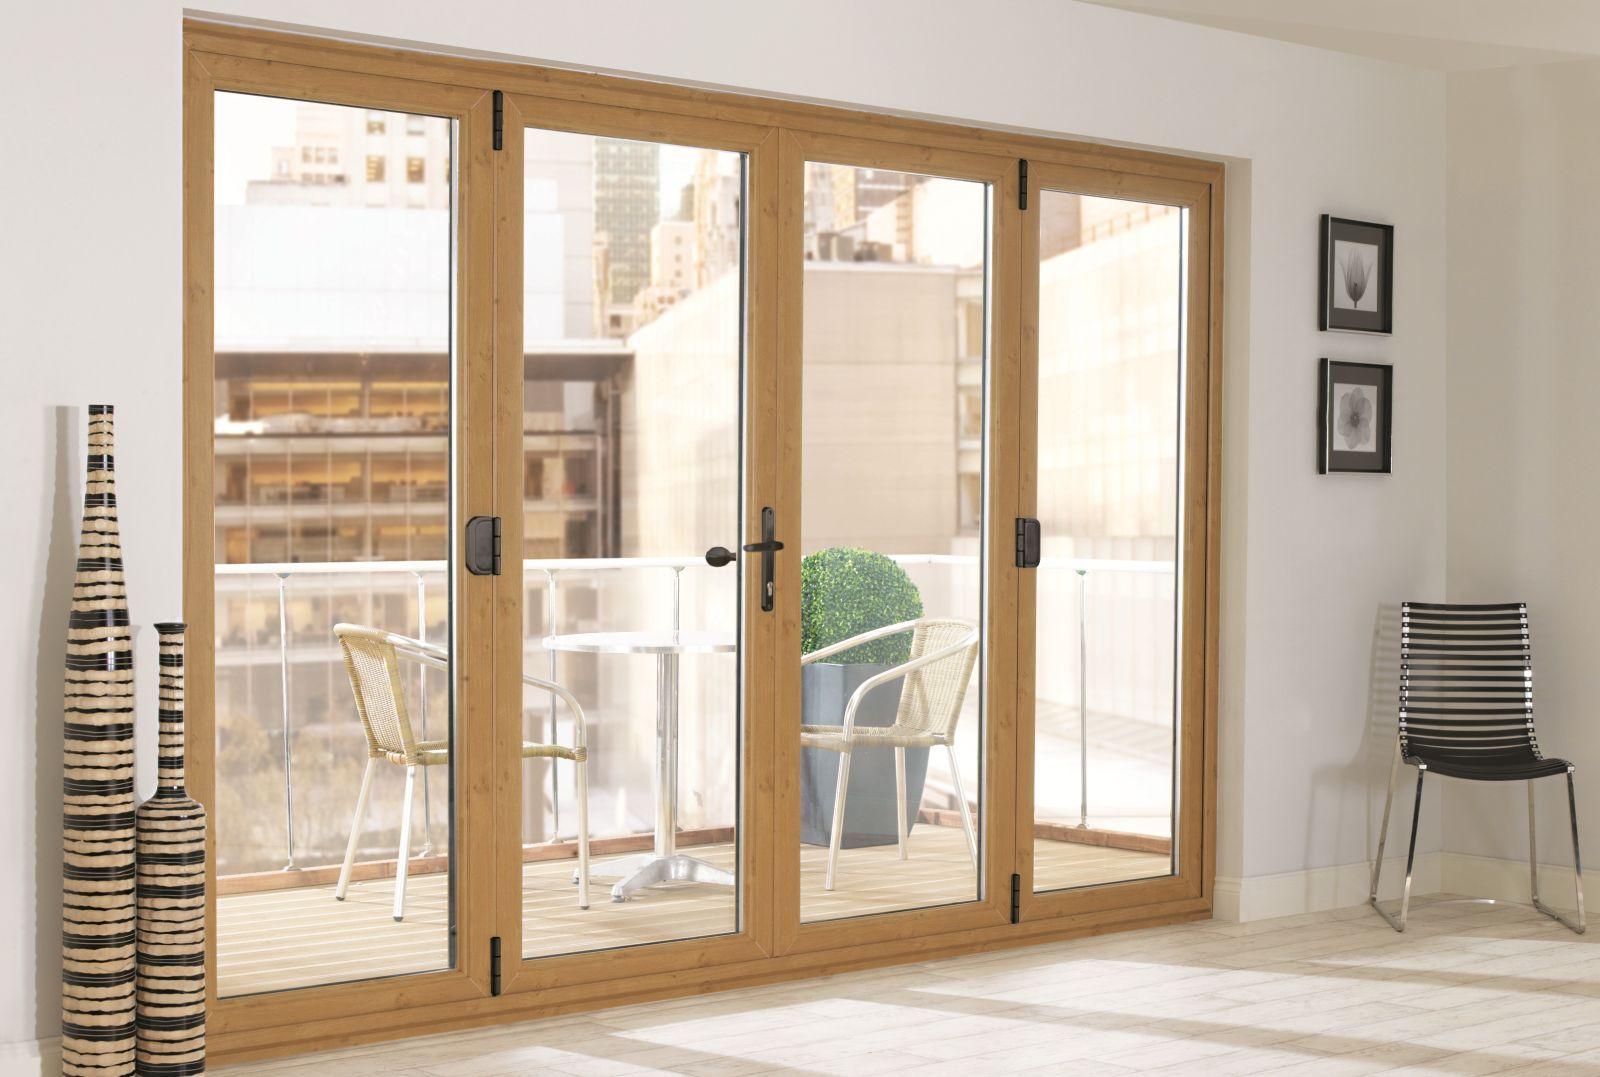 Upvc Doors London Doors Interior French Doors And Upvc Windows